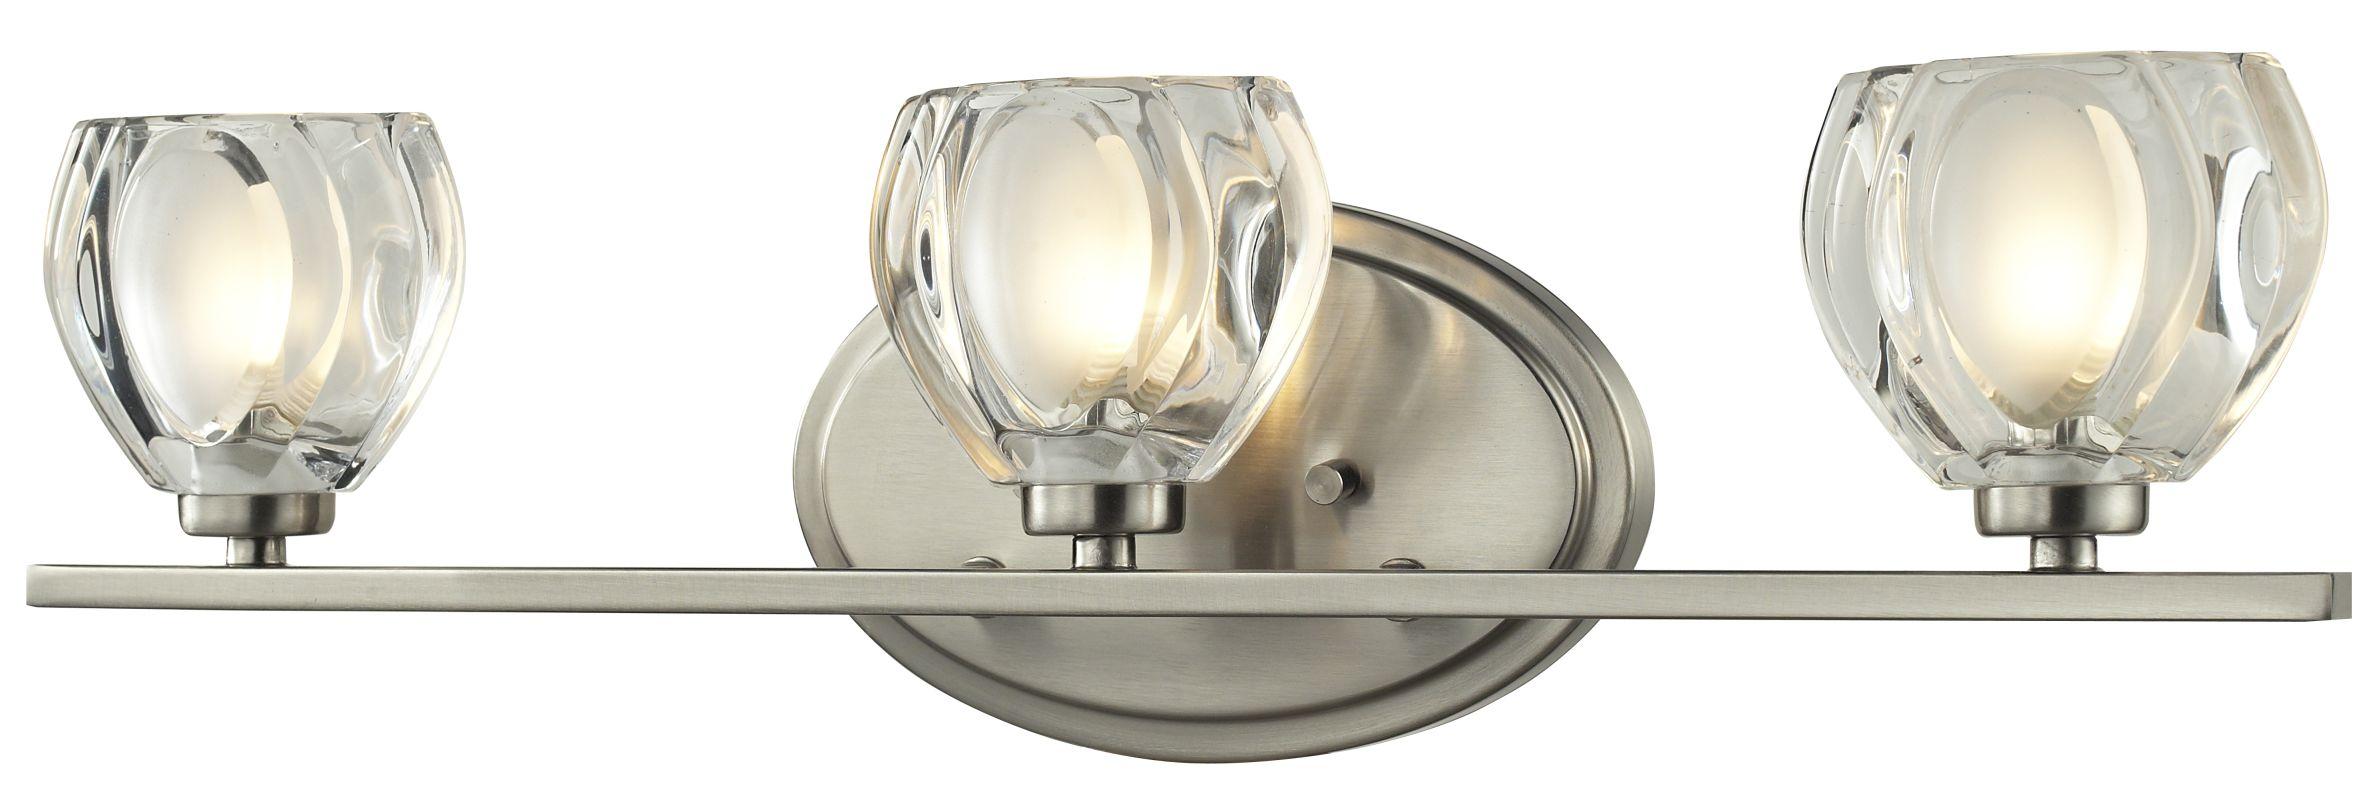 Z-Lite 3022-3V Hale 3 Light ADA Compliant Bathroom Vanity Light with Sale $260.00 ITEM: bci2373774 ID#:3022-3V UPC: 685659027846 :